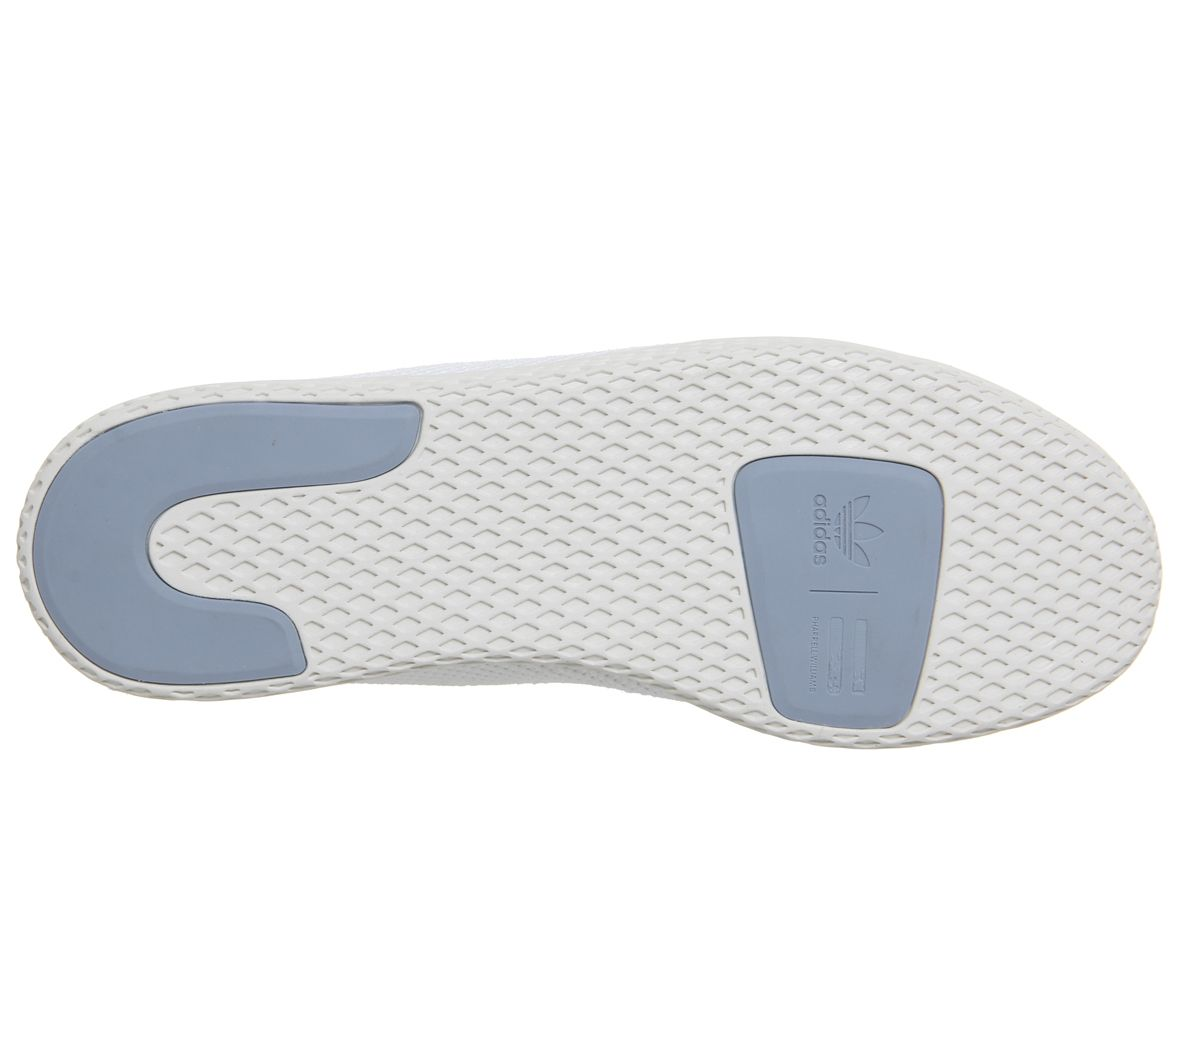 outlet store 1ad72 90213 Da-Uomo-Adidas-Pw-Tennis-HU-Bianco-Scarpe-